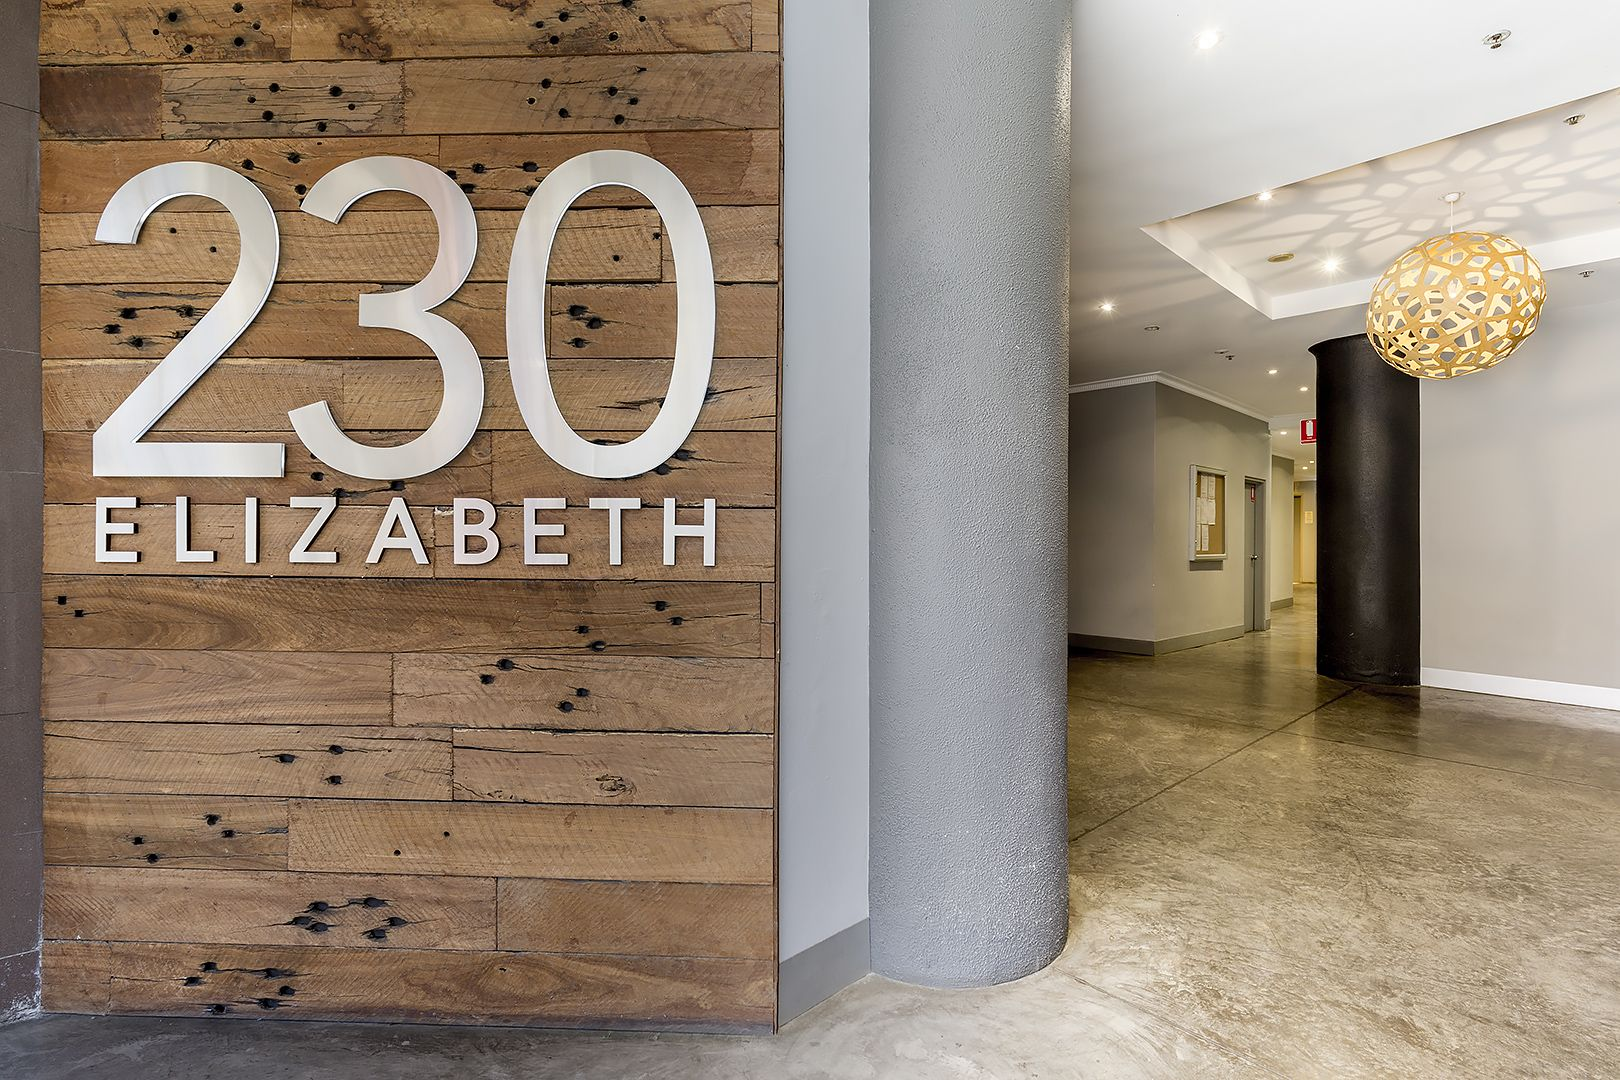 44/230 Elizabeth Street, Surry Hills